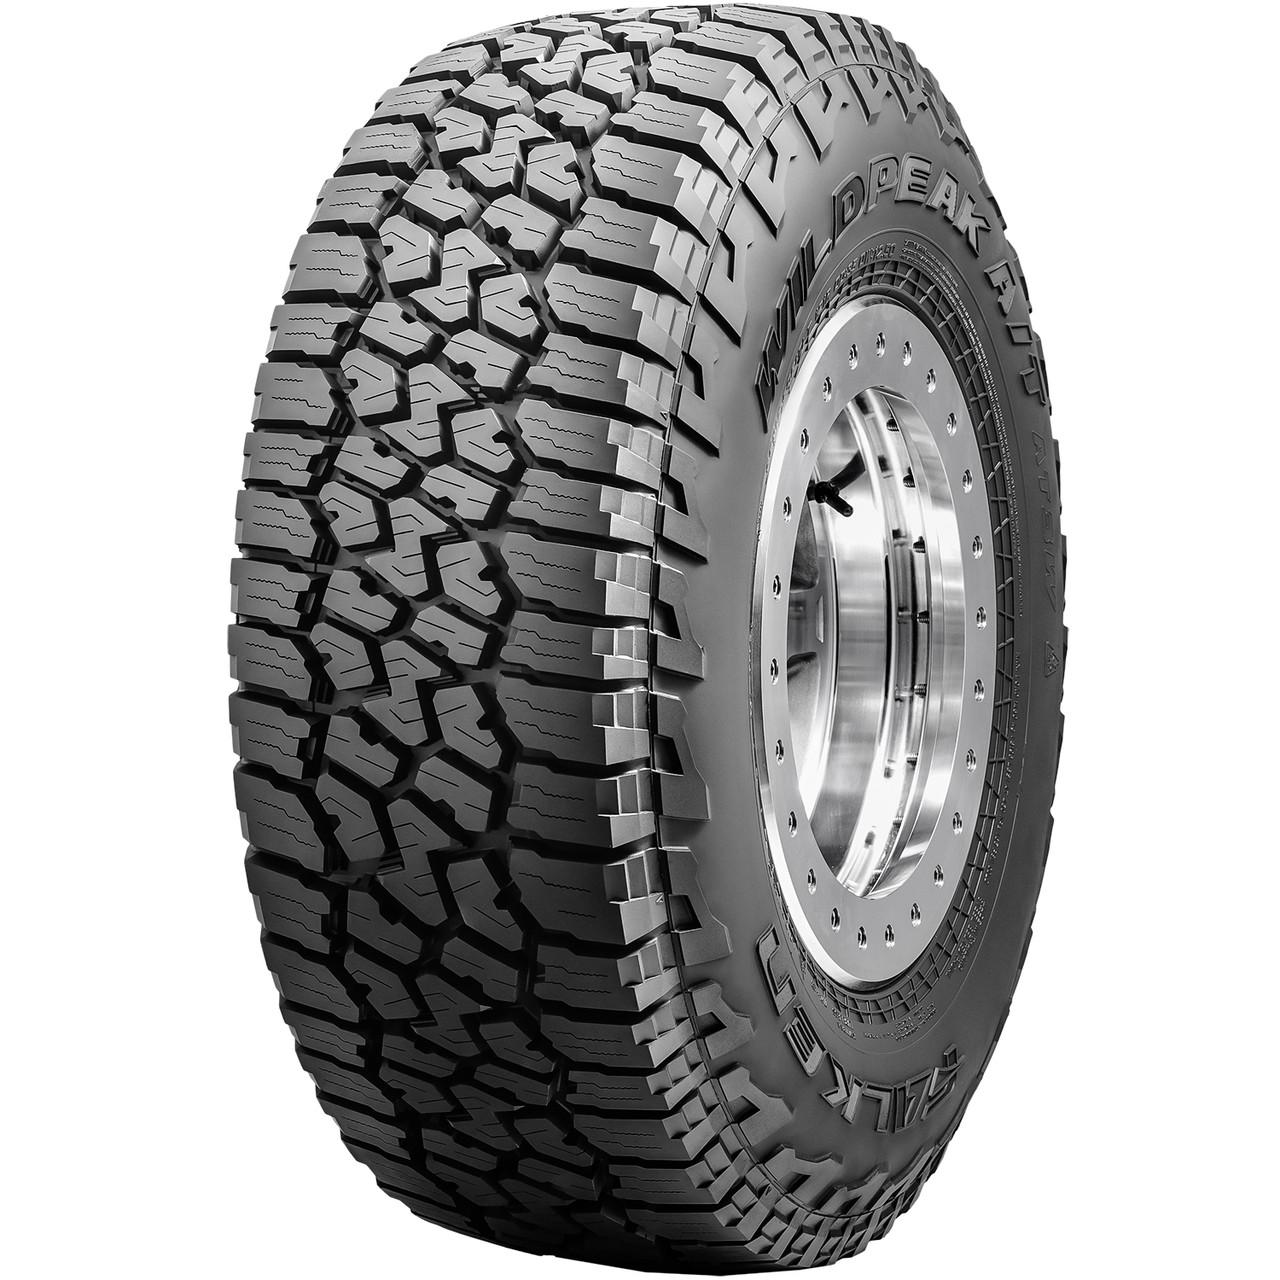 PriorityTire.com coupon: Falken Wildpeak A/T3W 245/70R17 XL All Terrain Tire